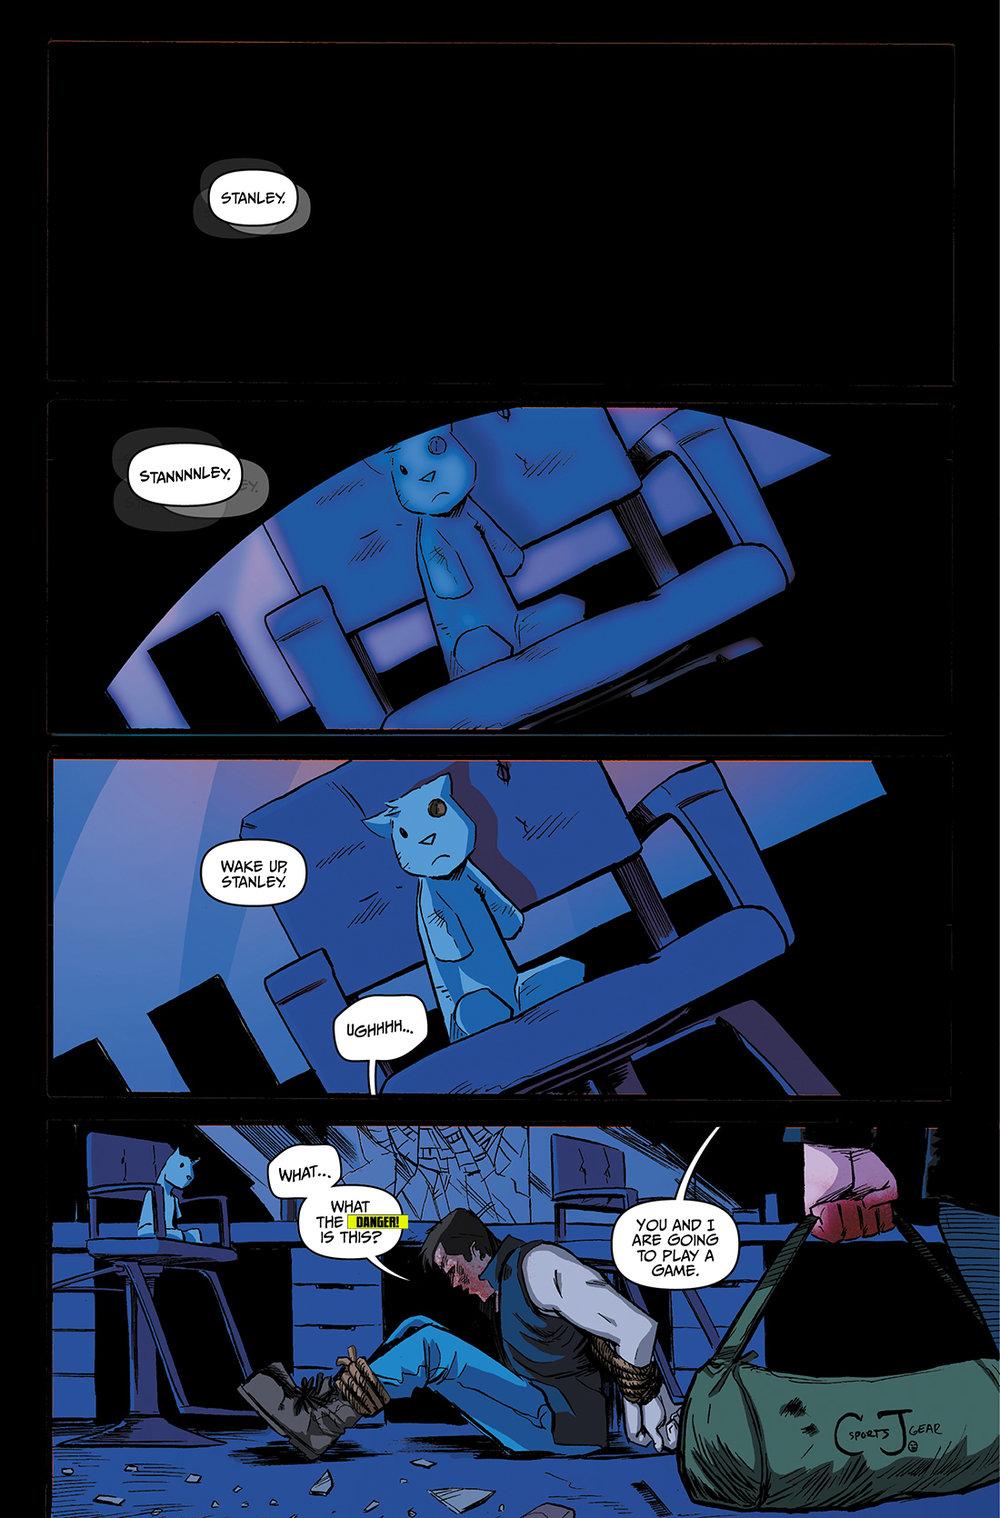 Spencer & Locke #2 Page 1.jpg